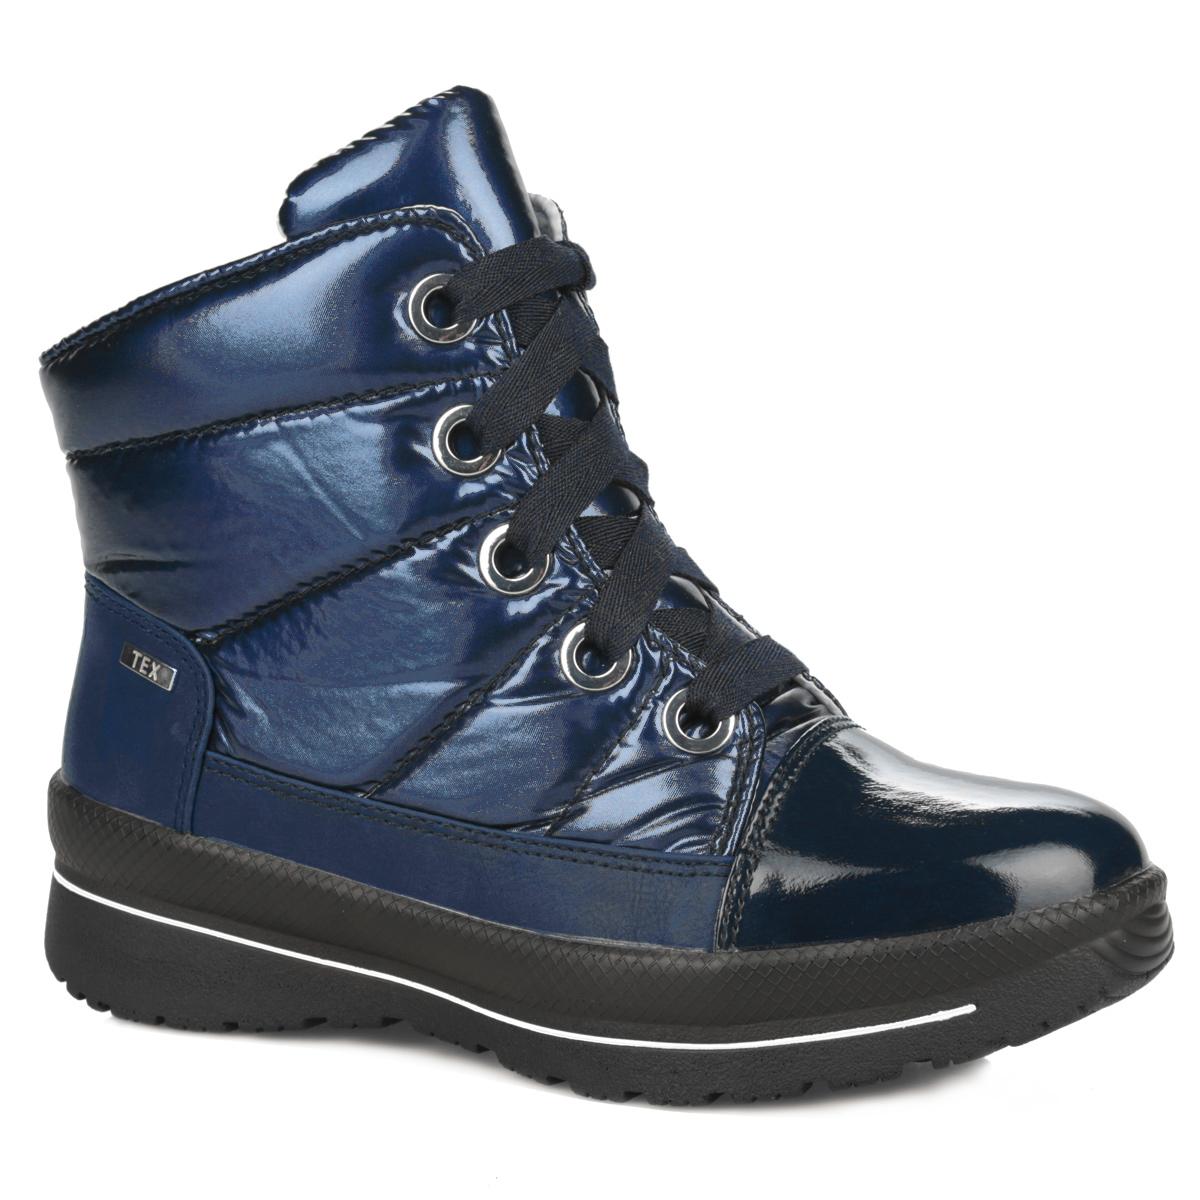 Caprice Ботинки женские. 9-26201-25